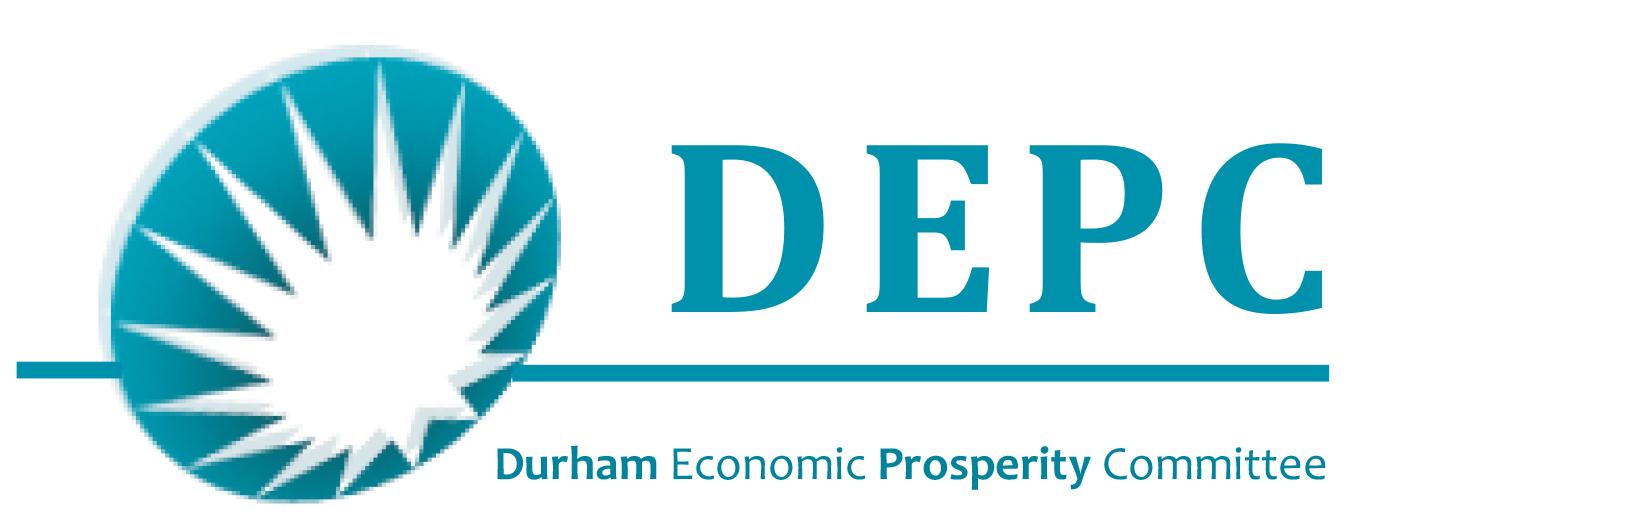 Durham Prosperity - DEPC